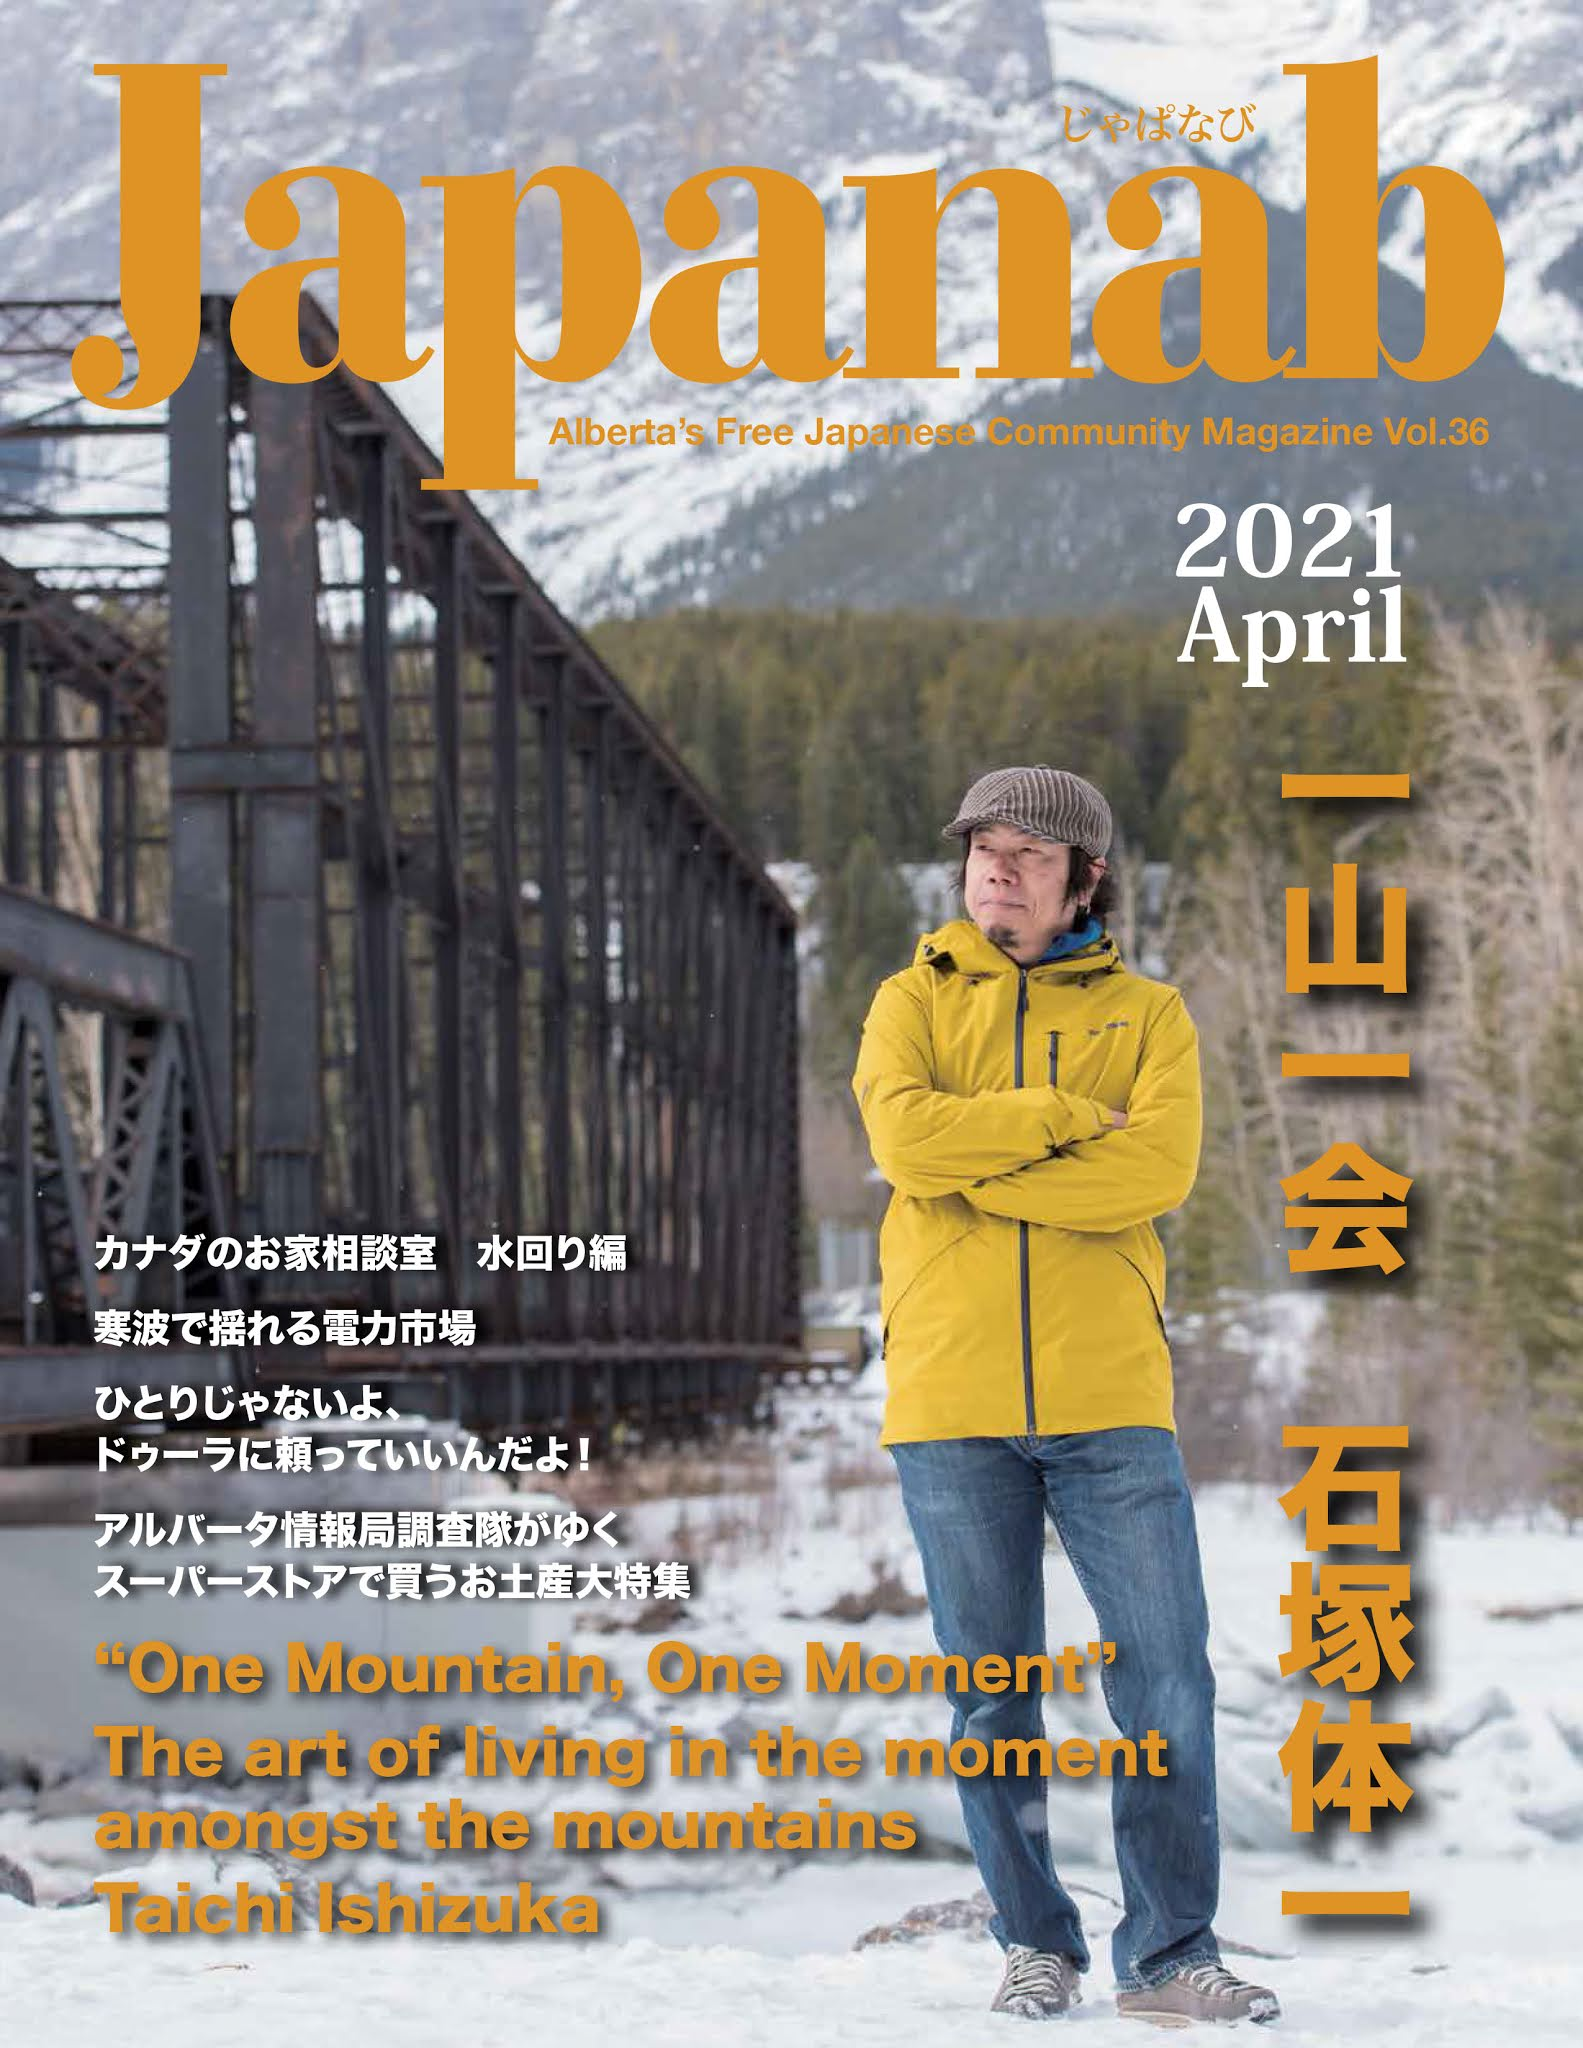 Japanab Vol. 36 - 2021 April